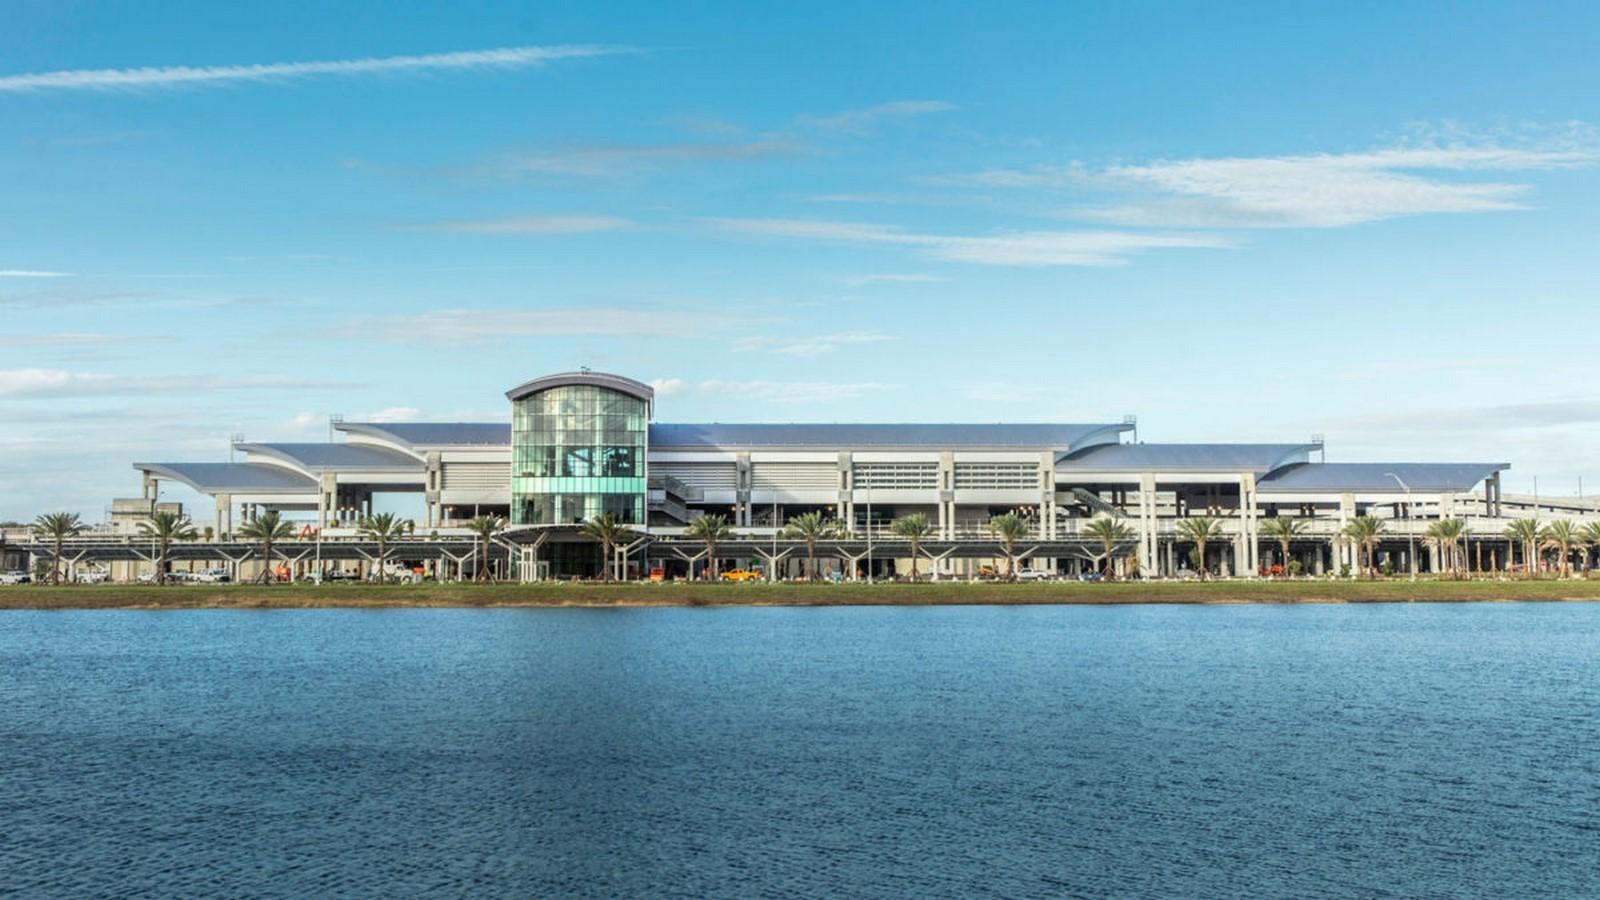 Orlando International Airport (OIA) Intermodal Terminal Facility- sheet5